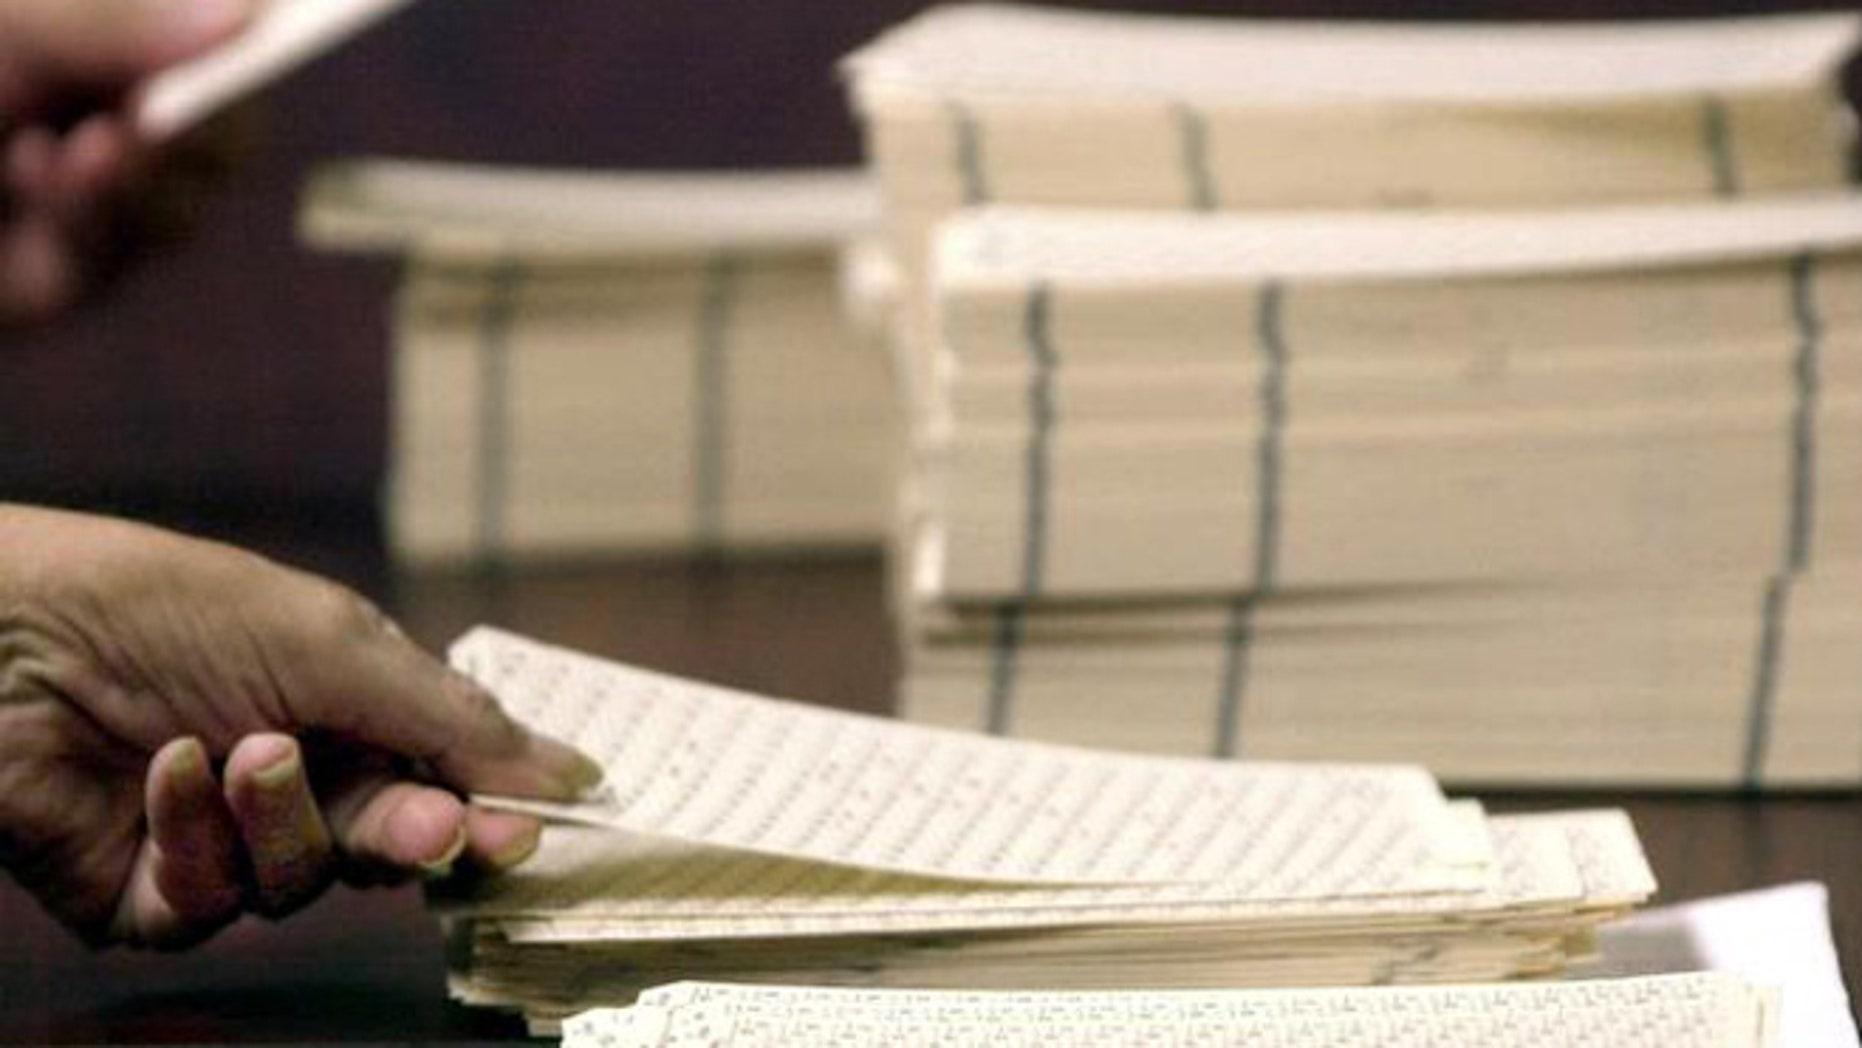 FILE: January 2000: Worker handles Broward County overseas absentee ballots during manual recount, Florida.